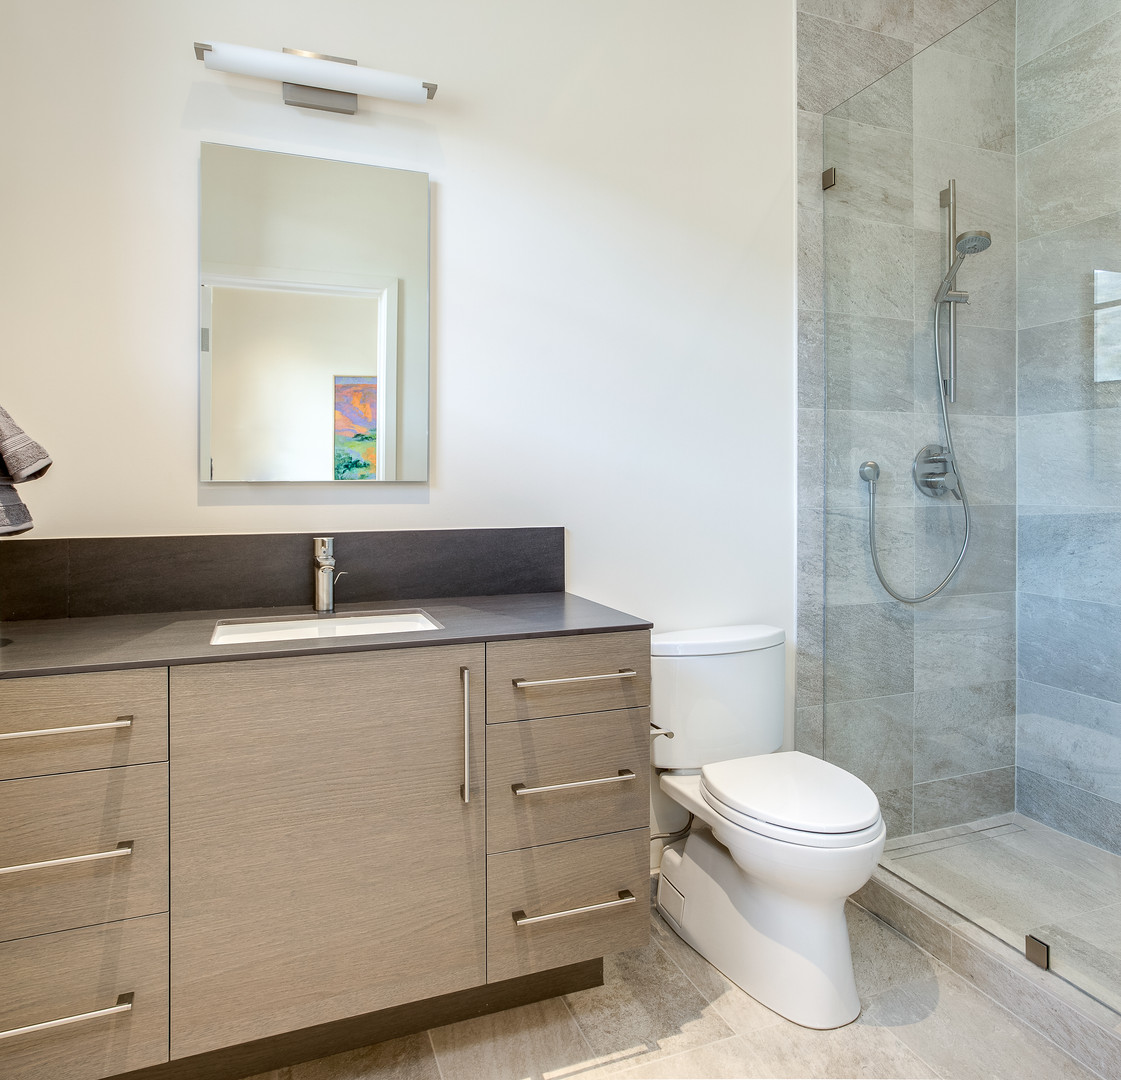 Stidy-Bed-Bath-2.jpg